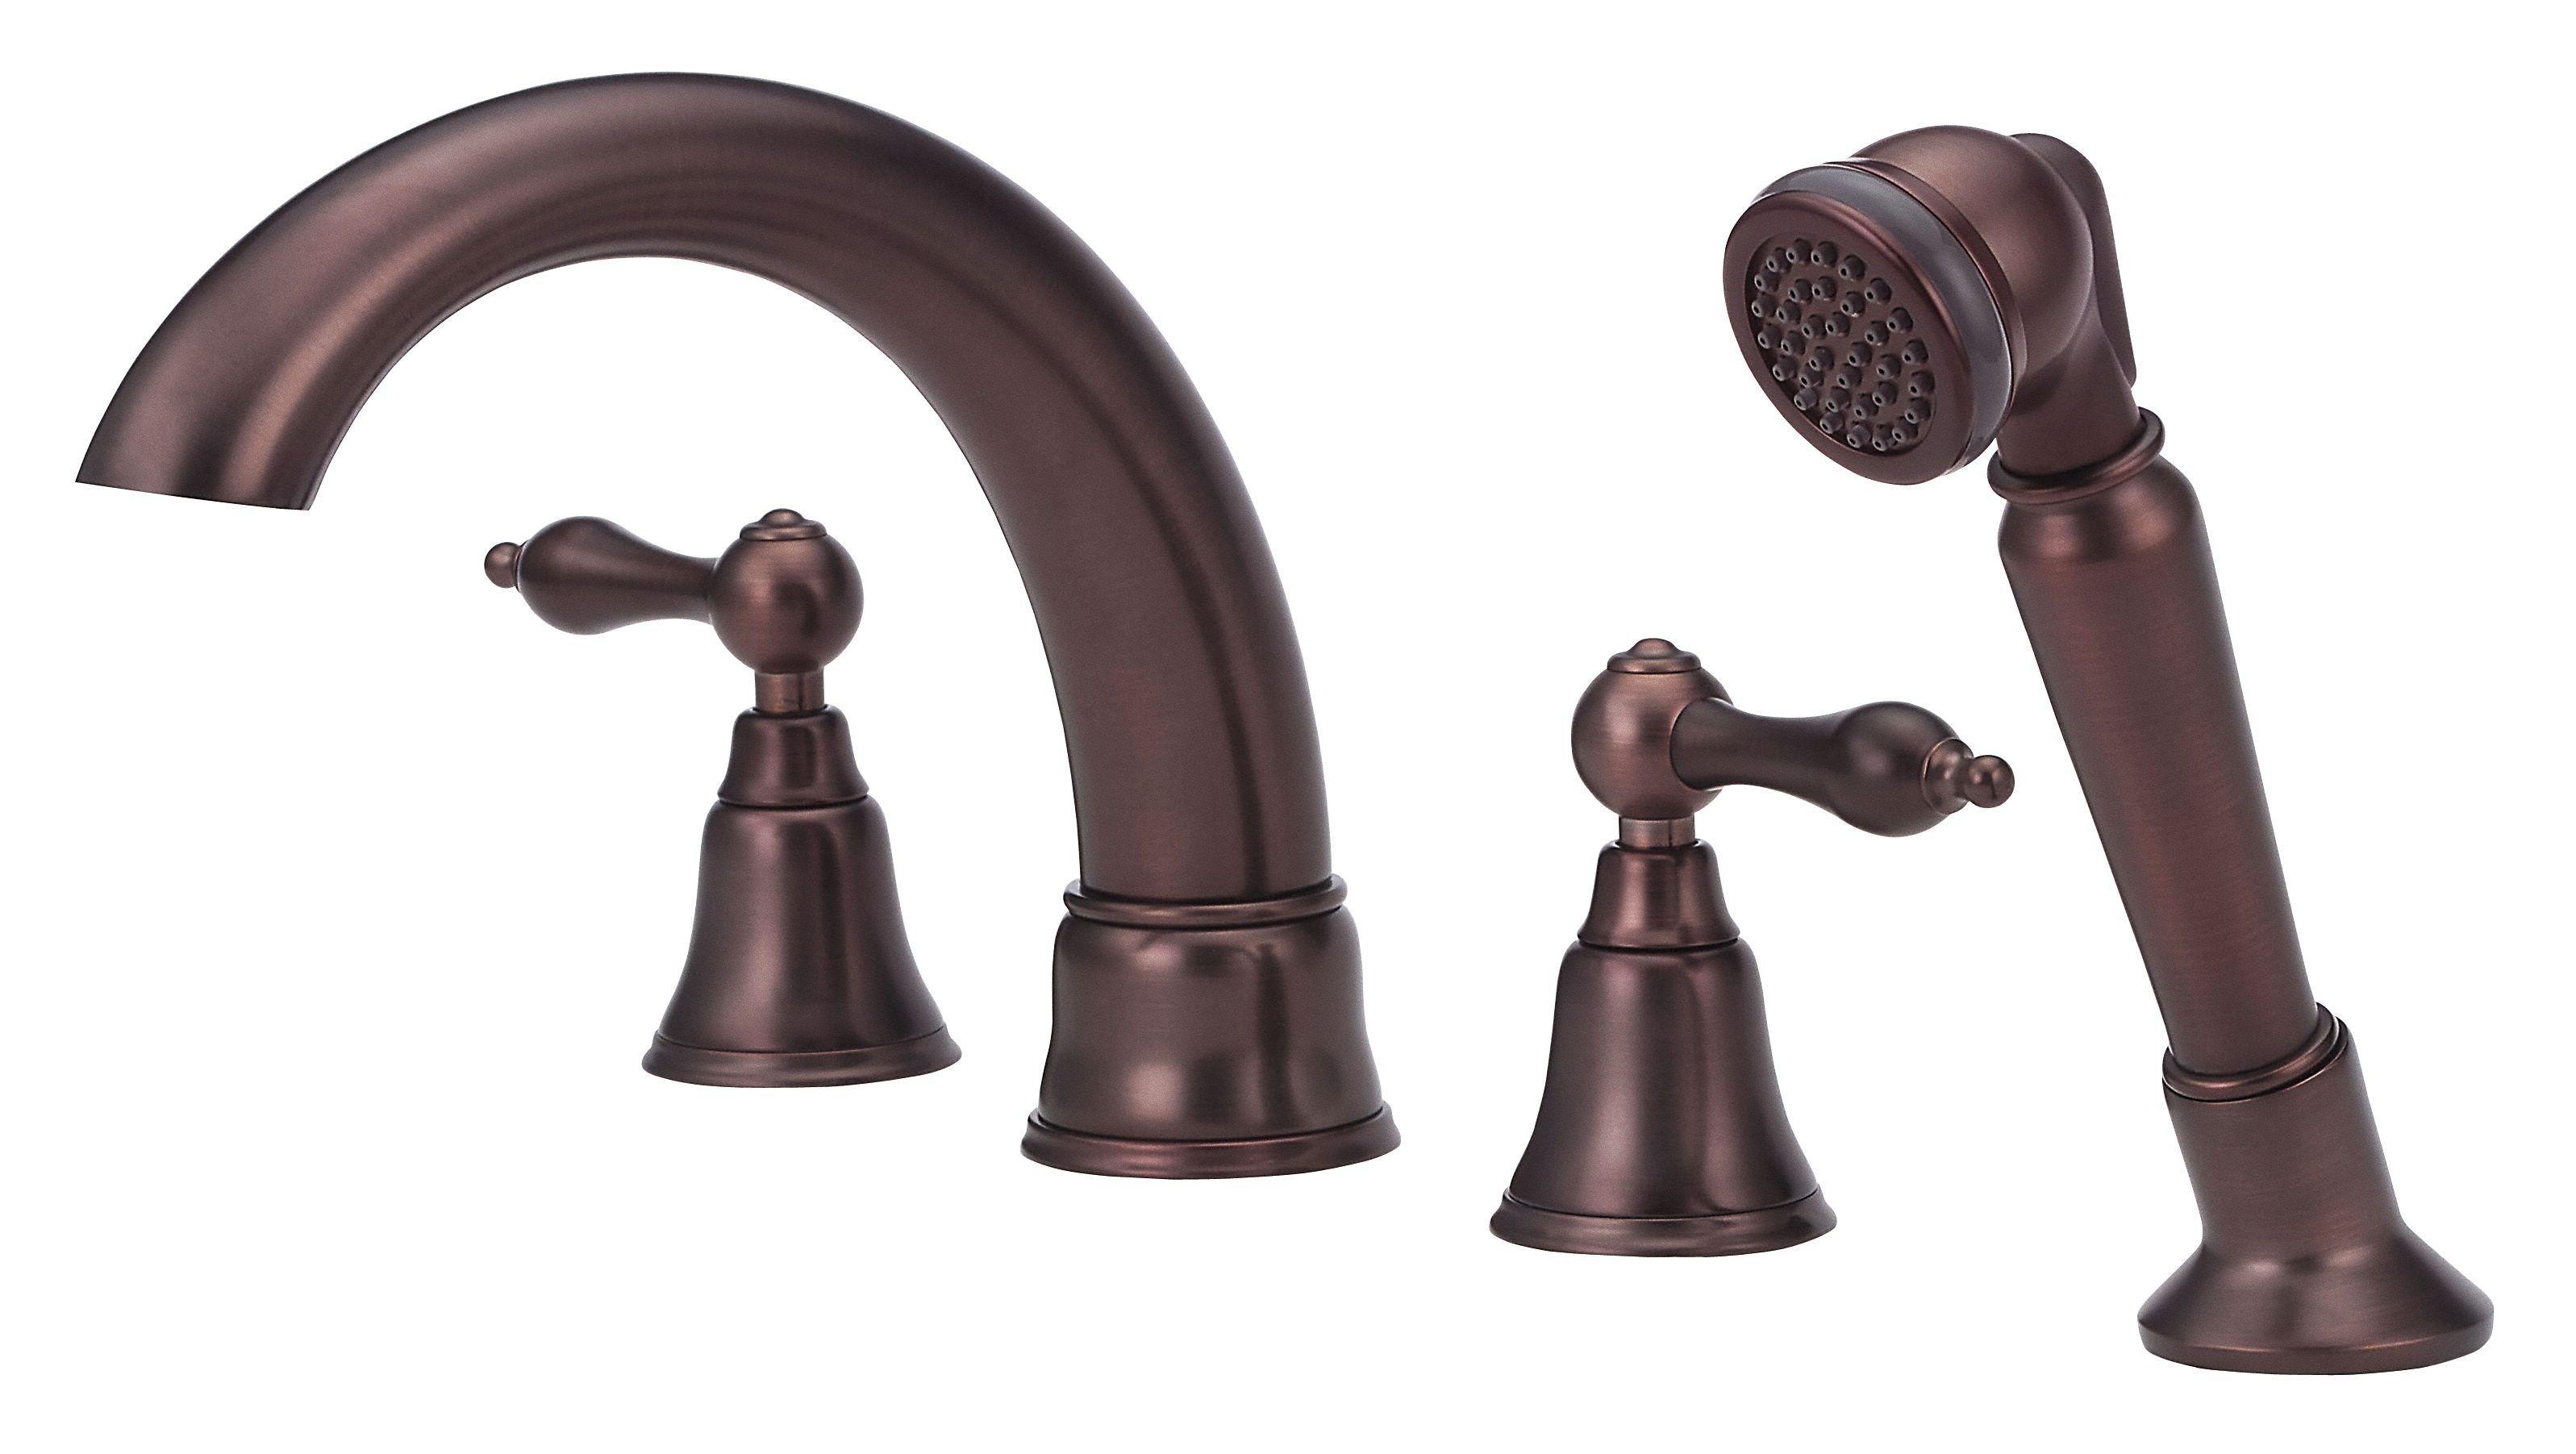 Best Furniture Ideas Ever Roman Tub Faucets Tub Faucet Tub Filler